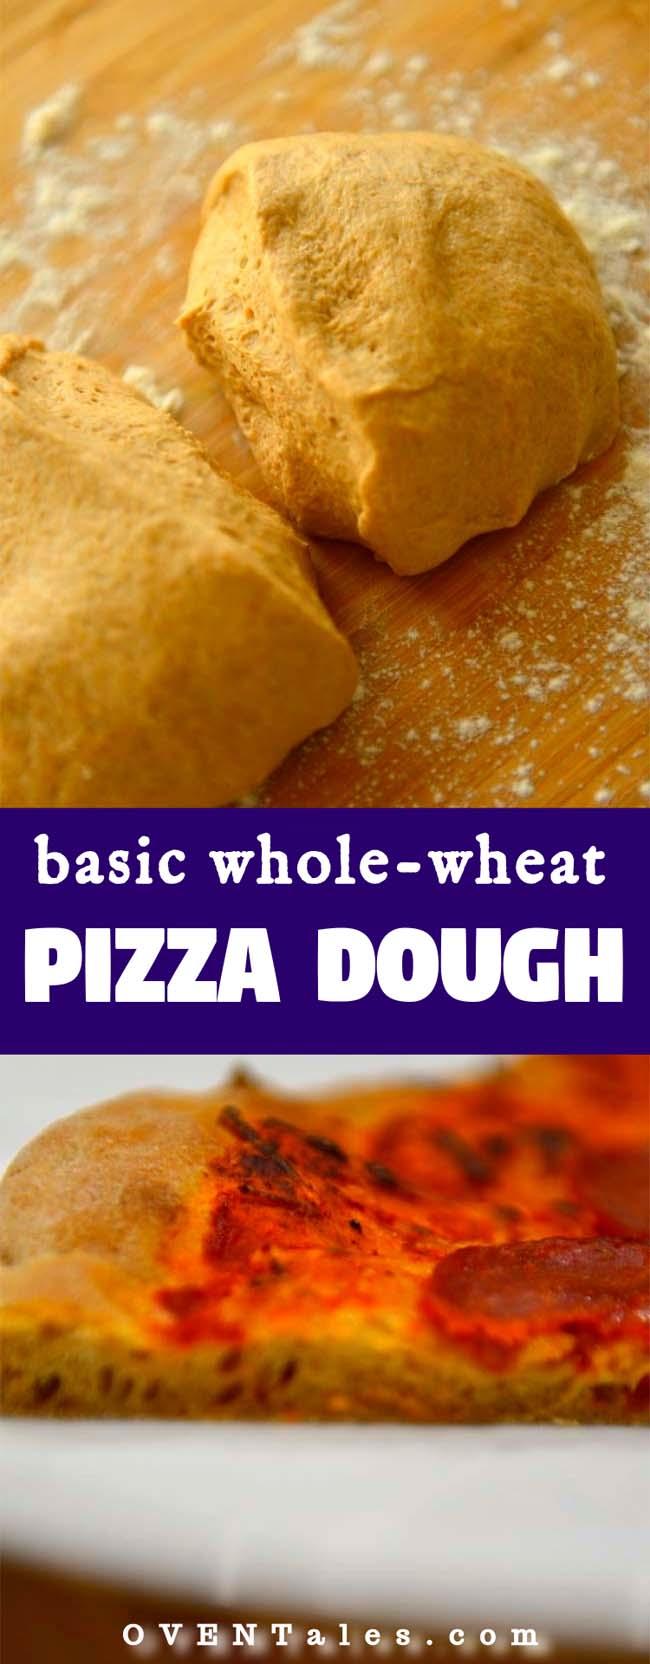 Easy to make basic whole wheat pizza dough piz